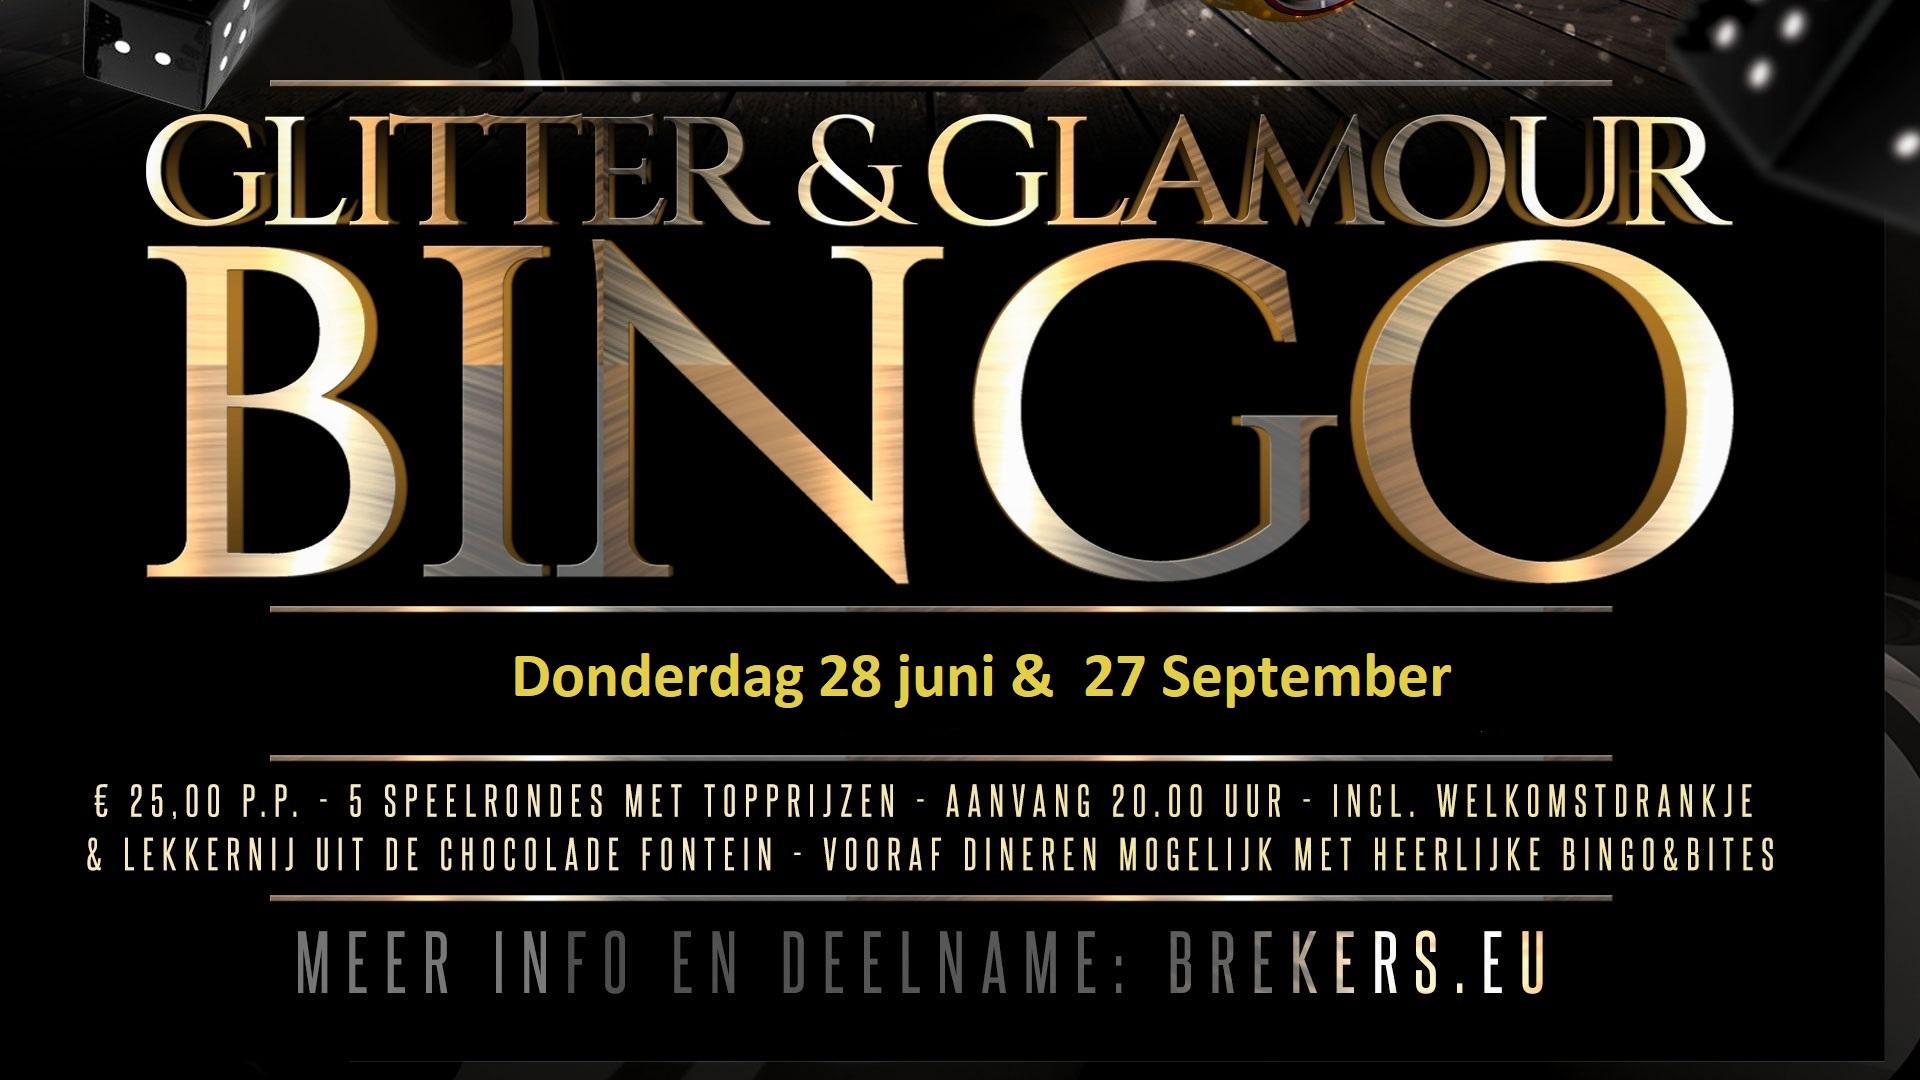 Glitter & Glamour Bingo 28 juni